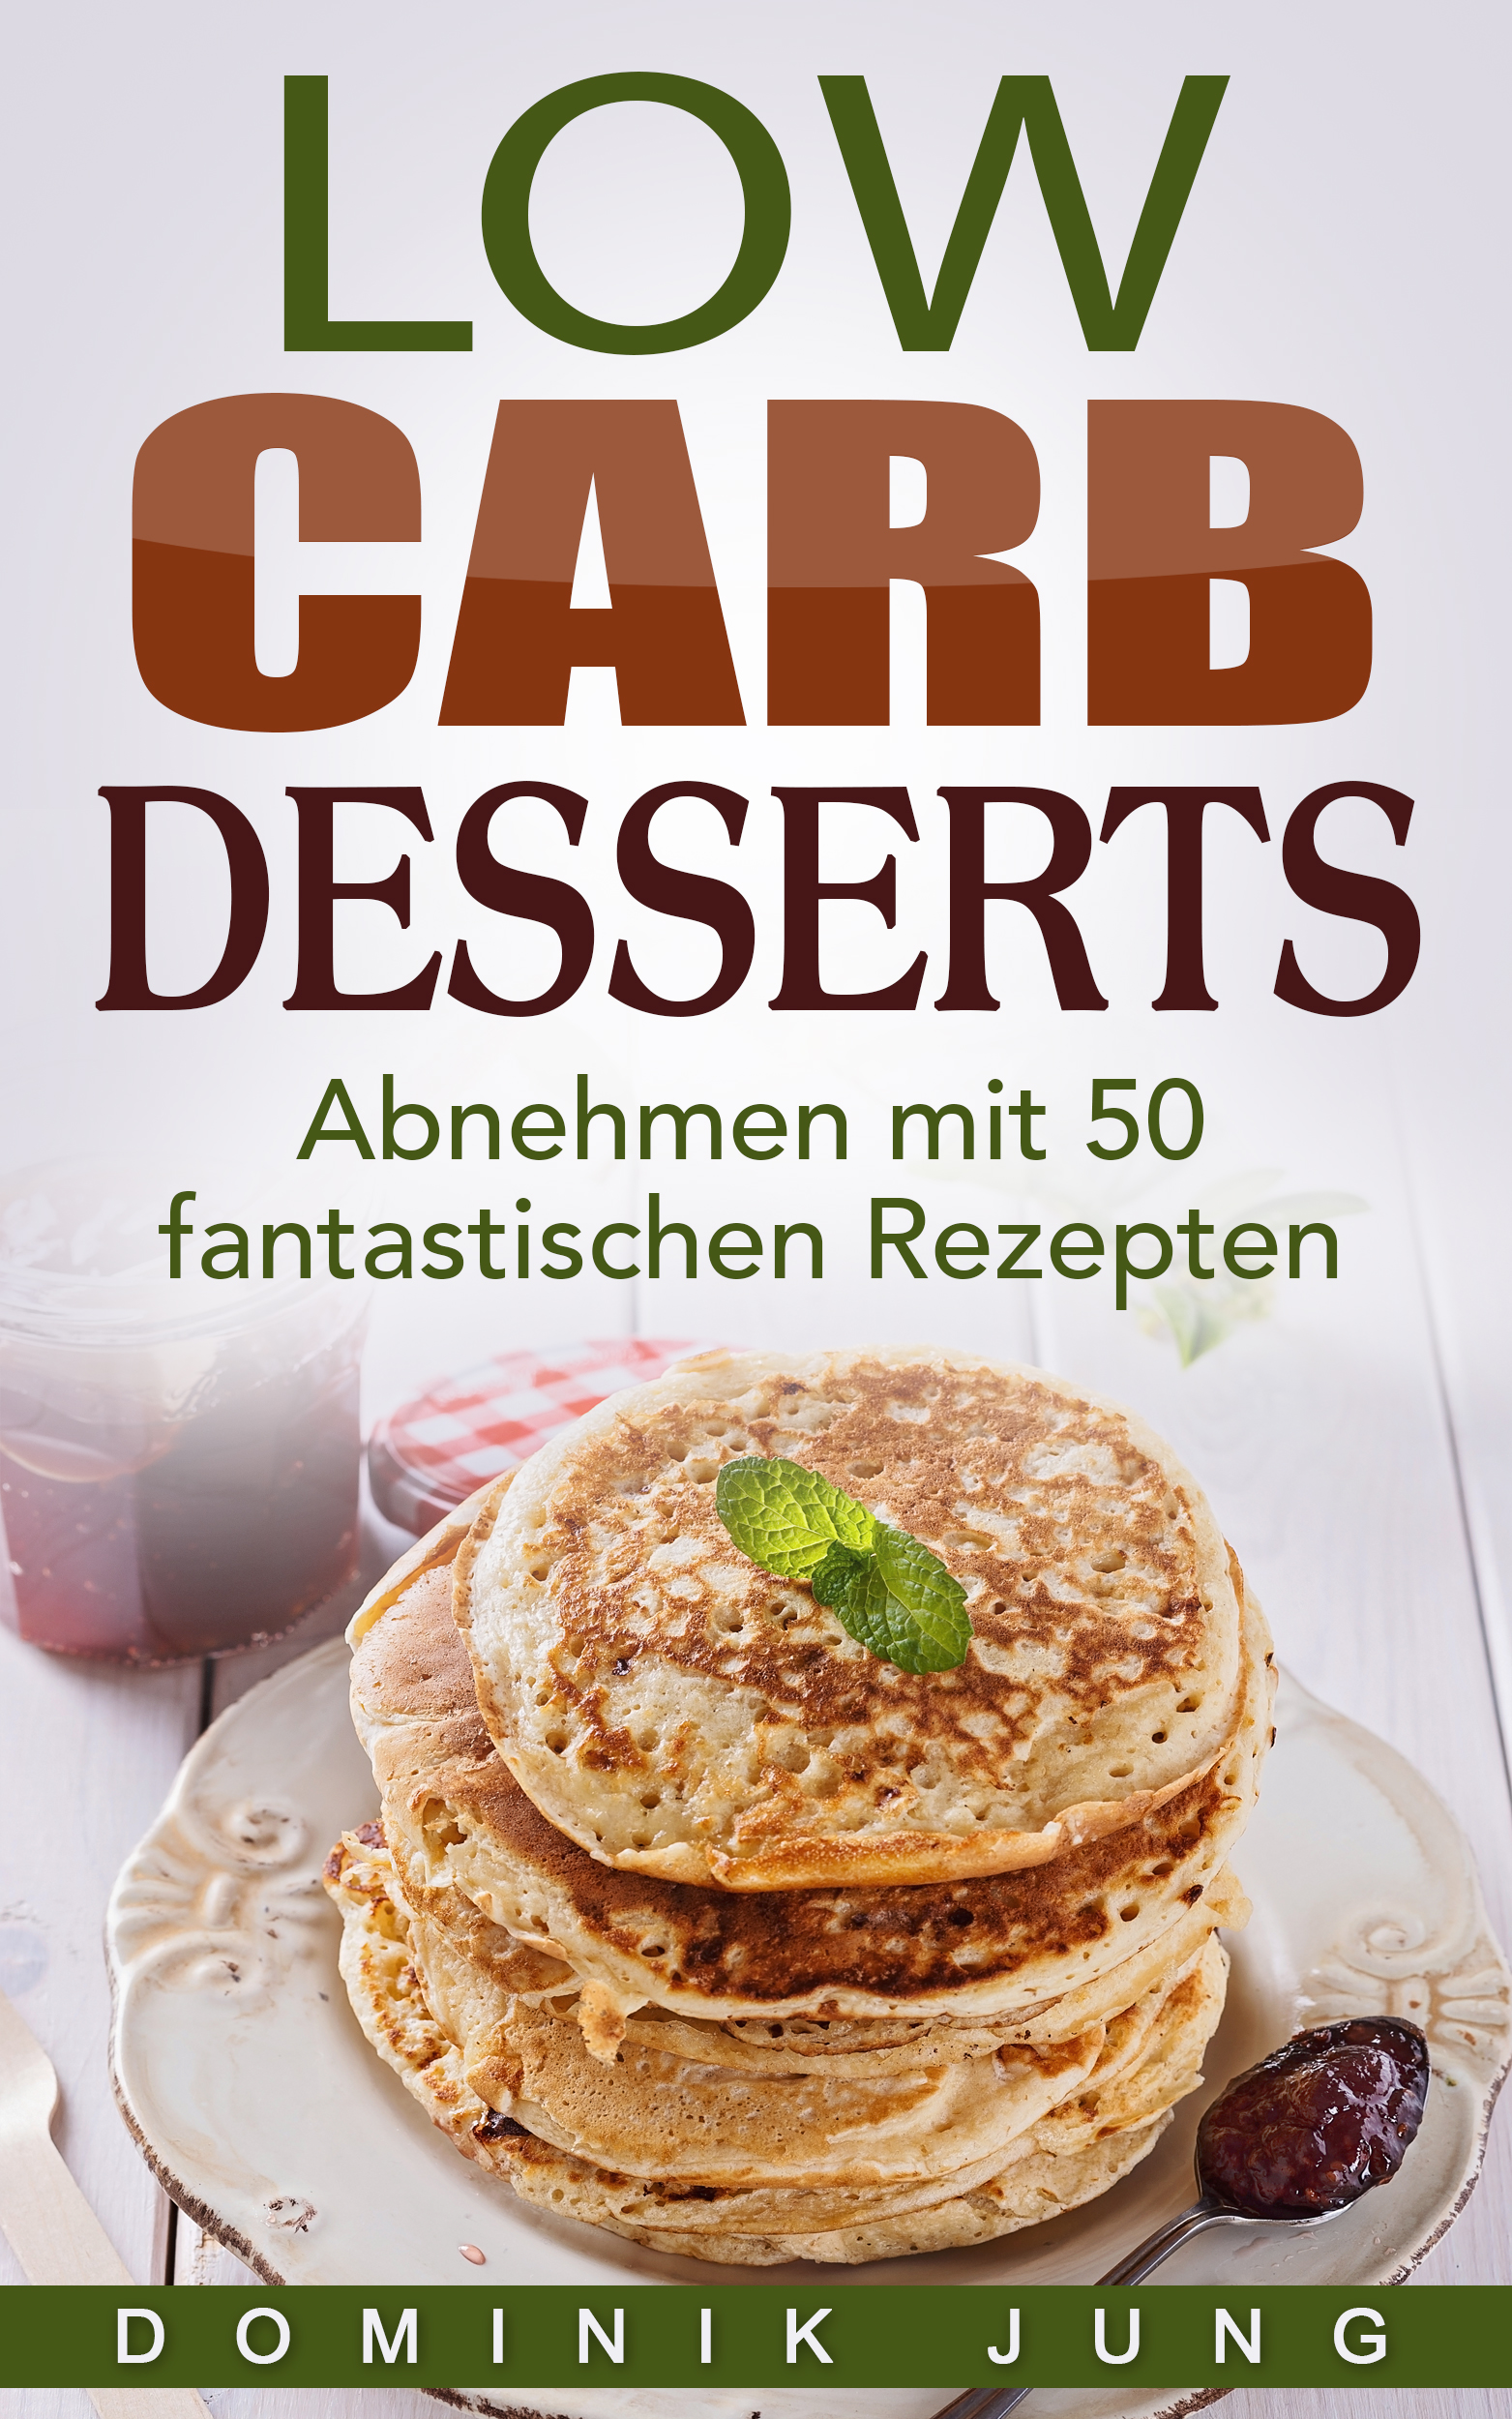 Dominik Jung – Low Carb Desserts